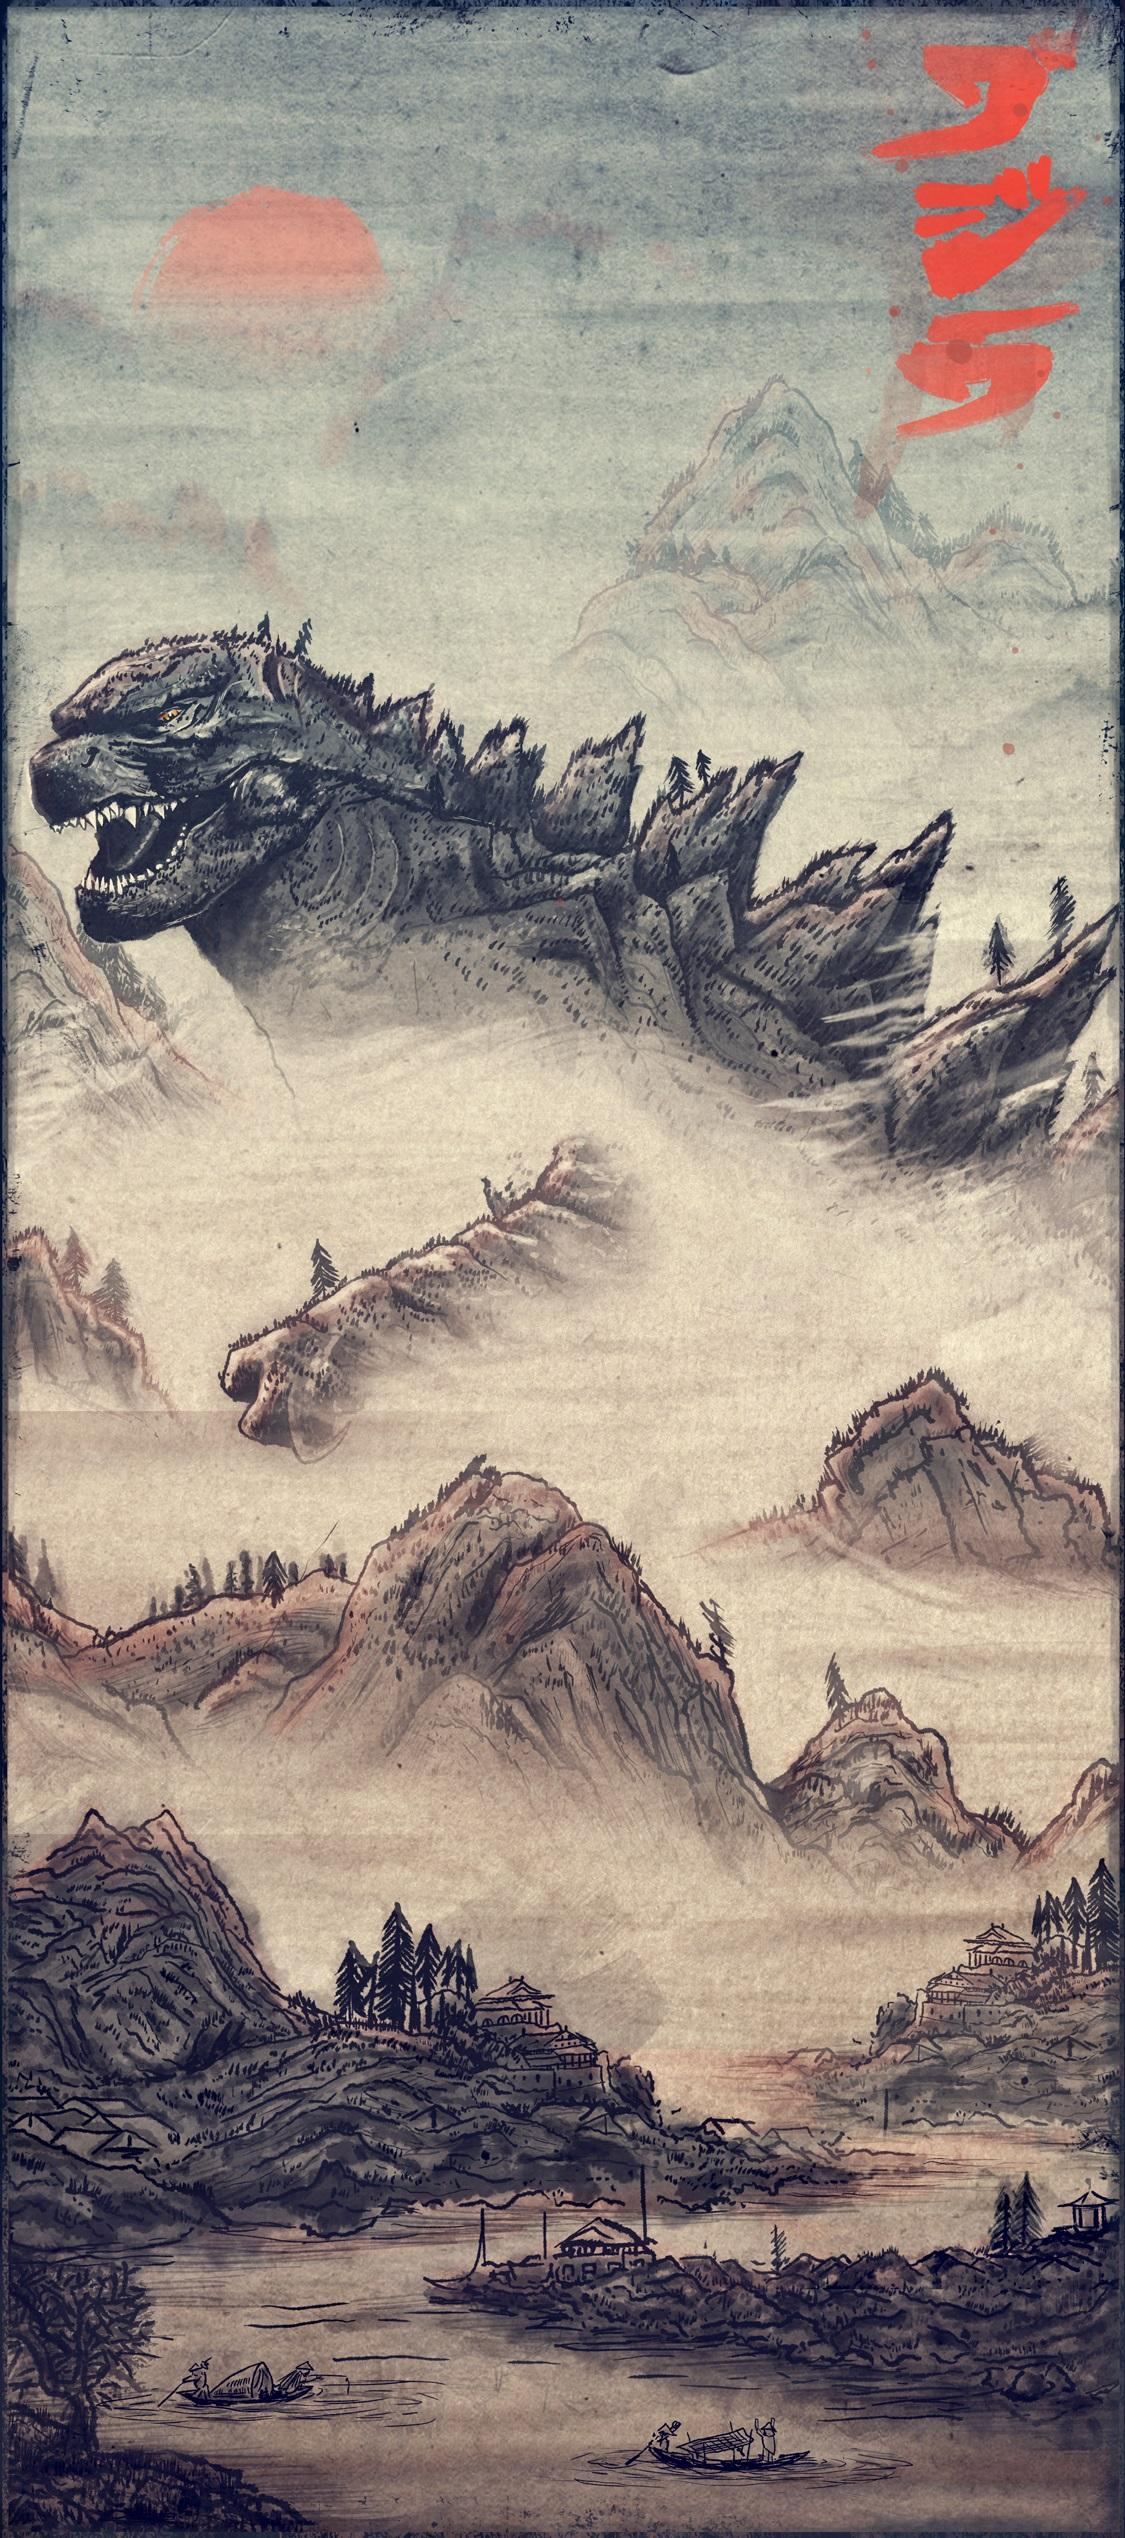 Godzilla by Daniel Nash